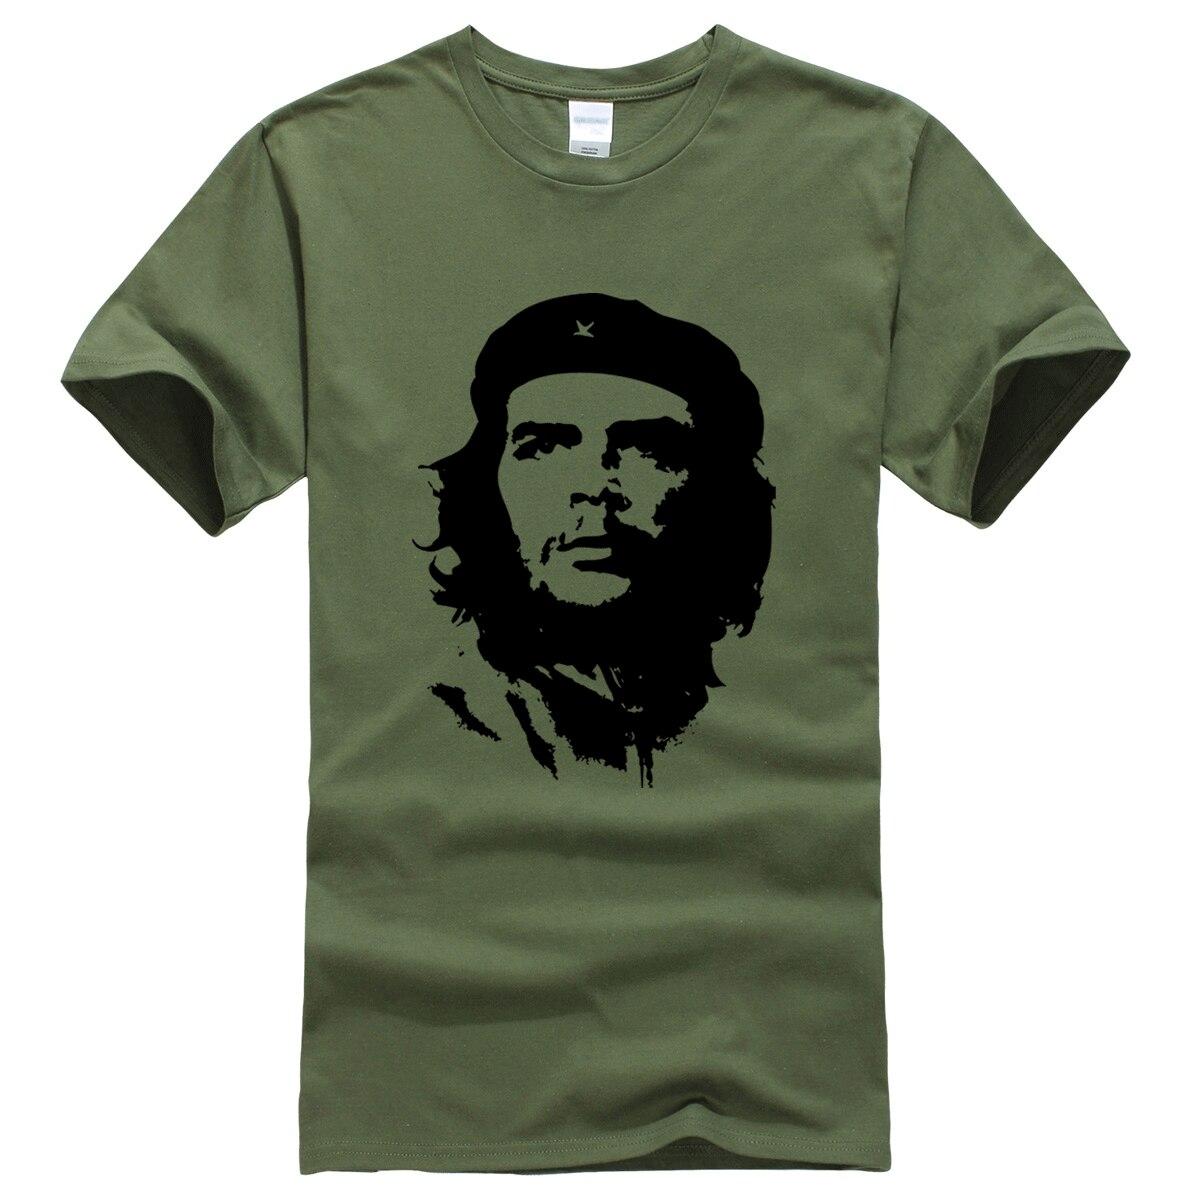 Che Guevara Hero Men T Shirt Printed 100% Cotton Short Sleeve T-Shirts Hipster Pattern Tops Tees Cool High Quality Male T-Shirt